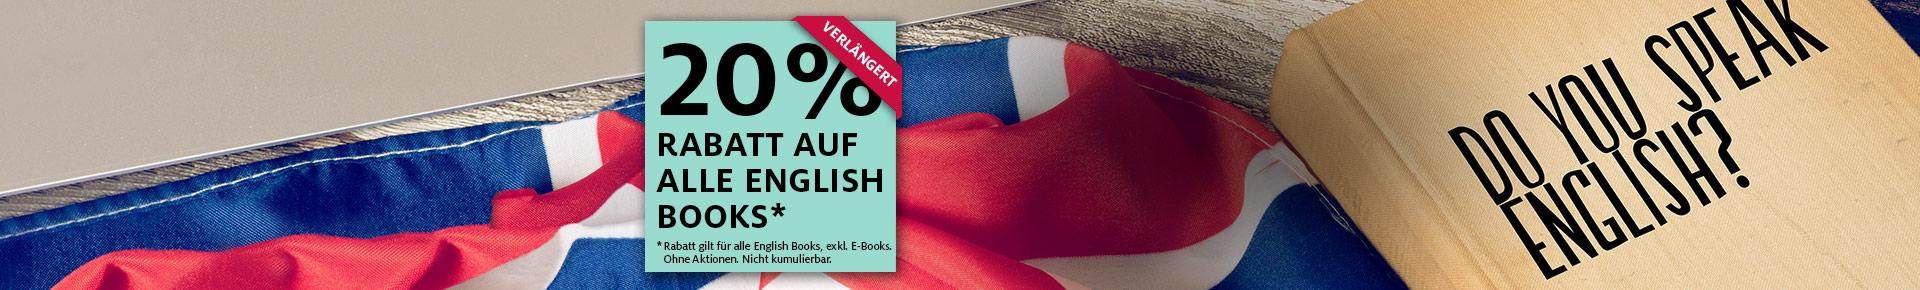 20% auf alle English Books